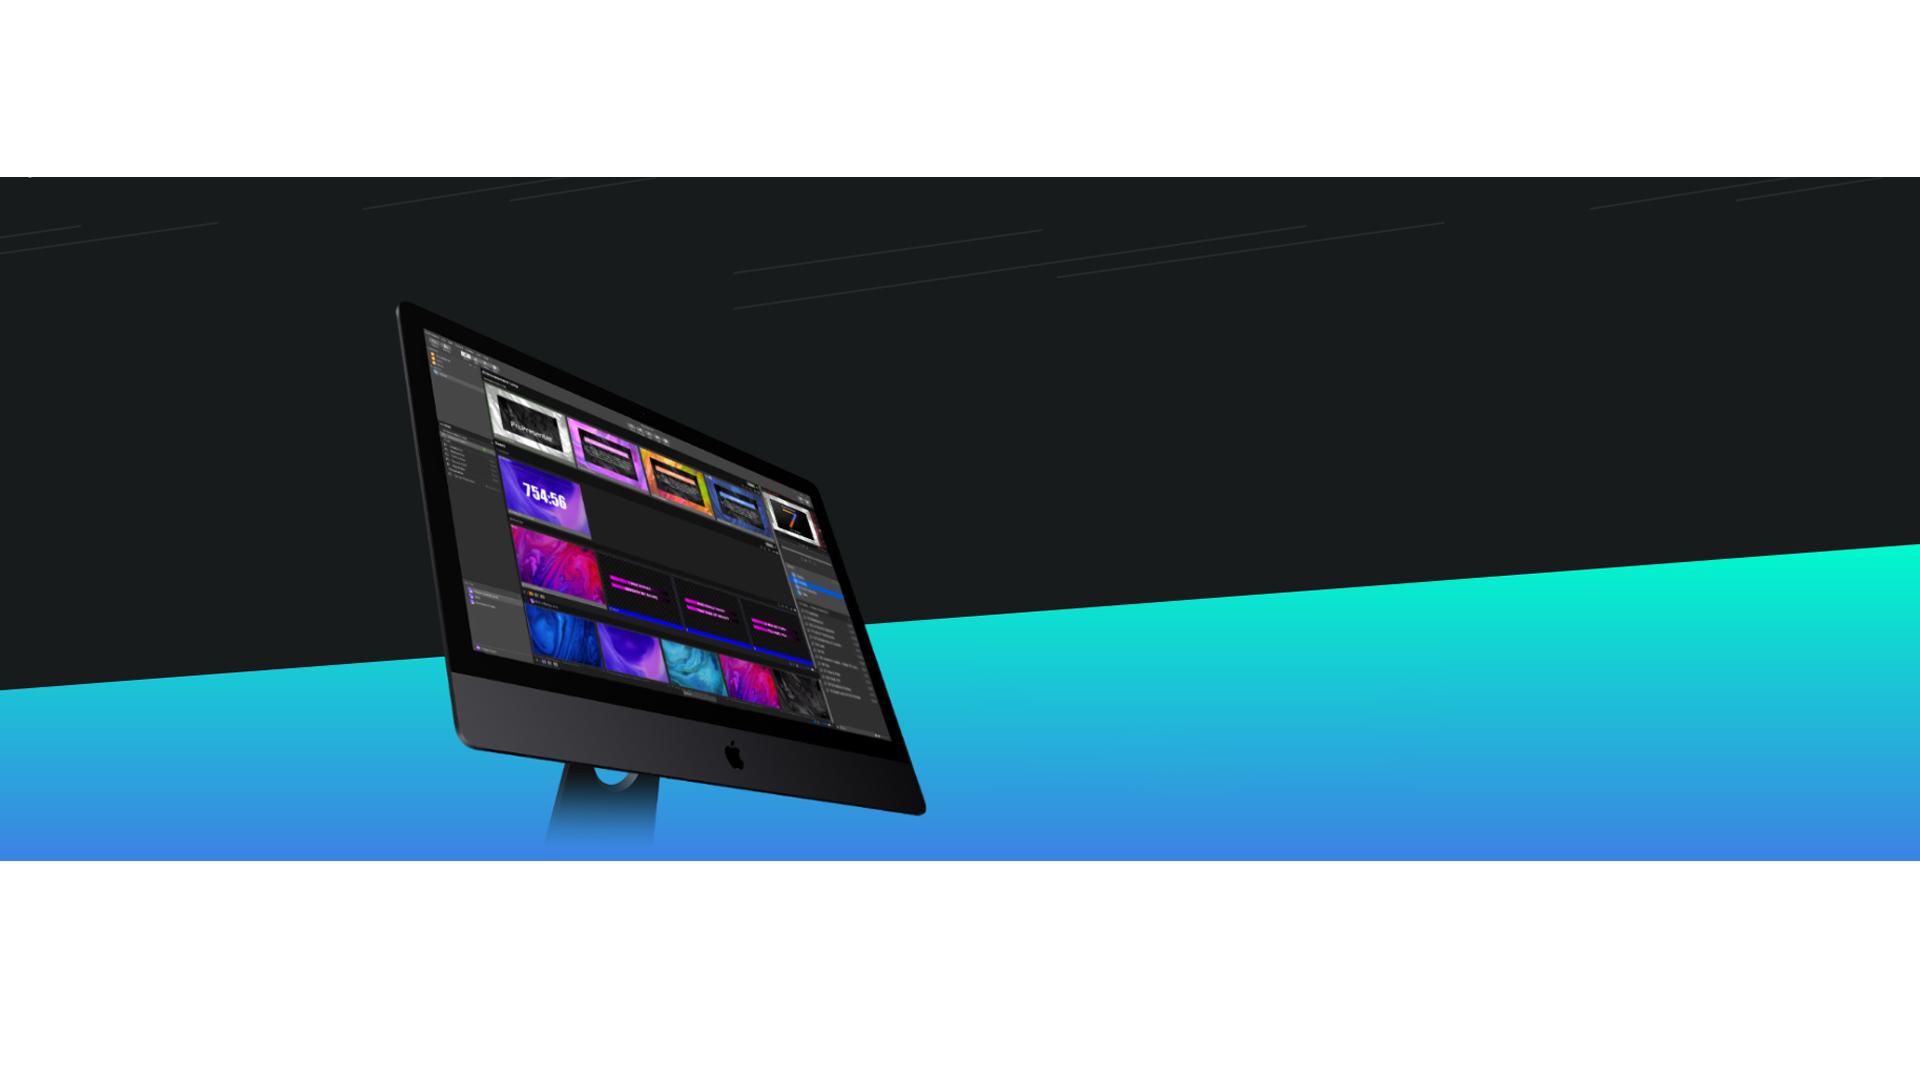 Presentacion Visual con ProPresenter